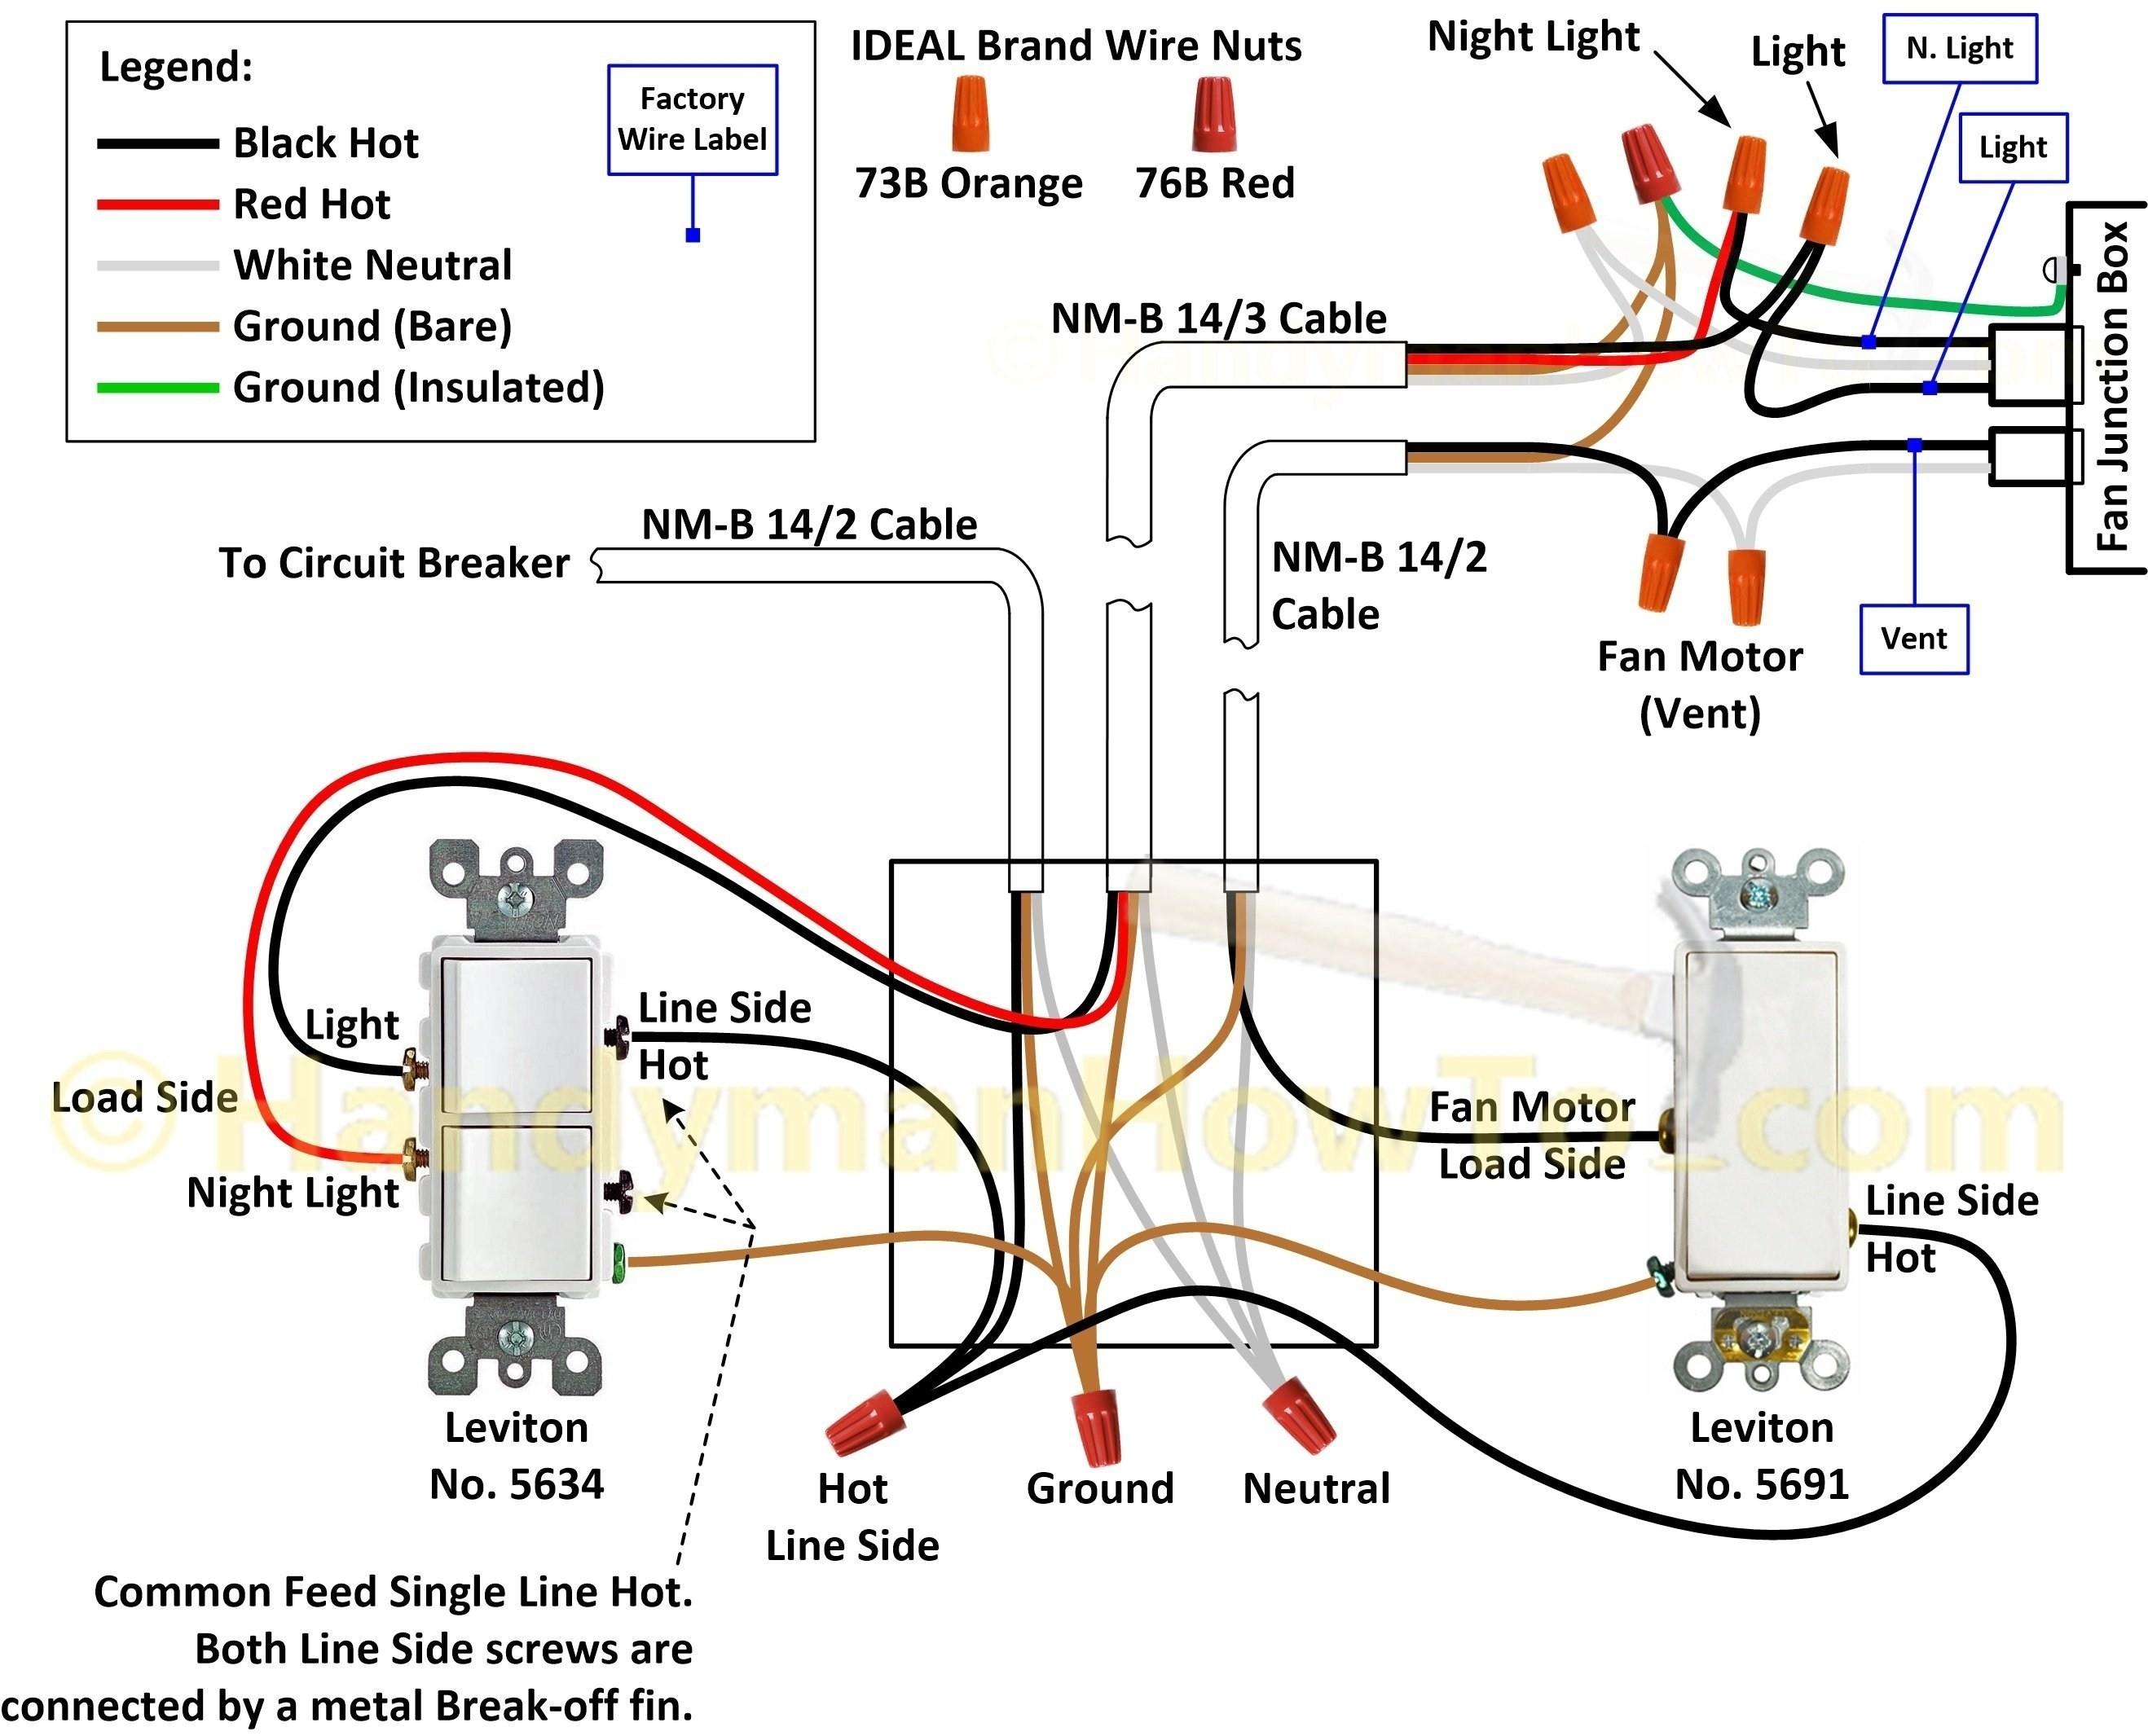 Car Light Wiring Diagram Refrence Wiring Diagram for Pool Light Of Car Light Wiring Diagram